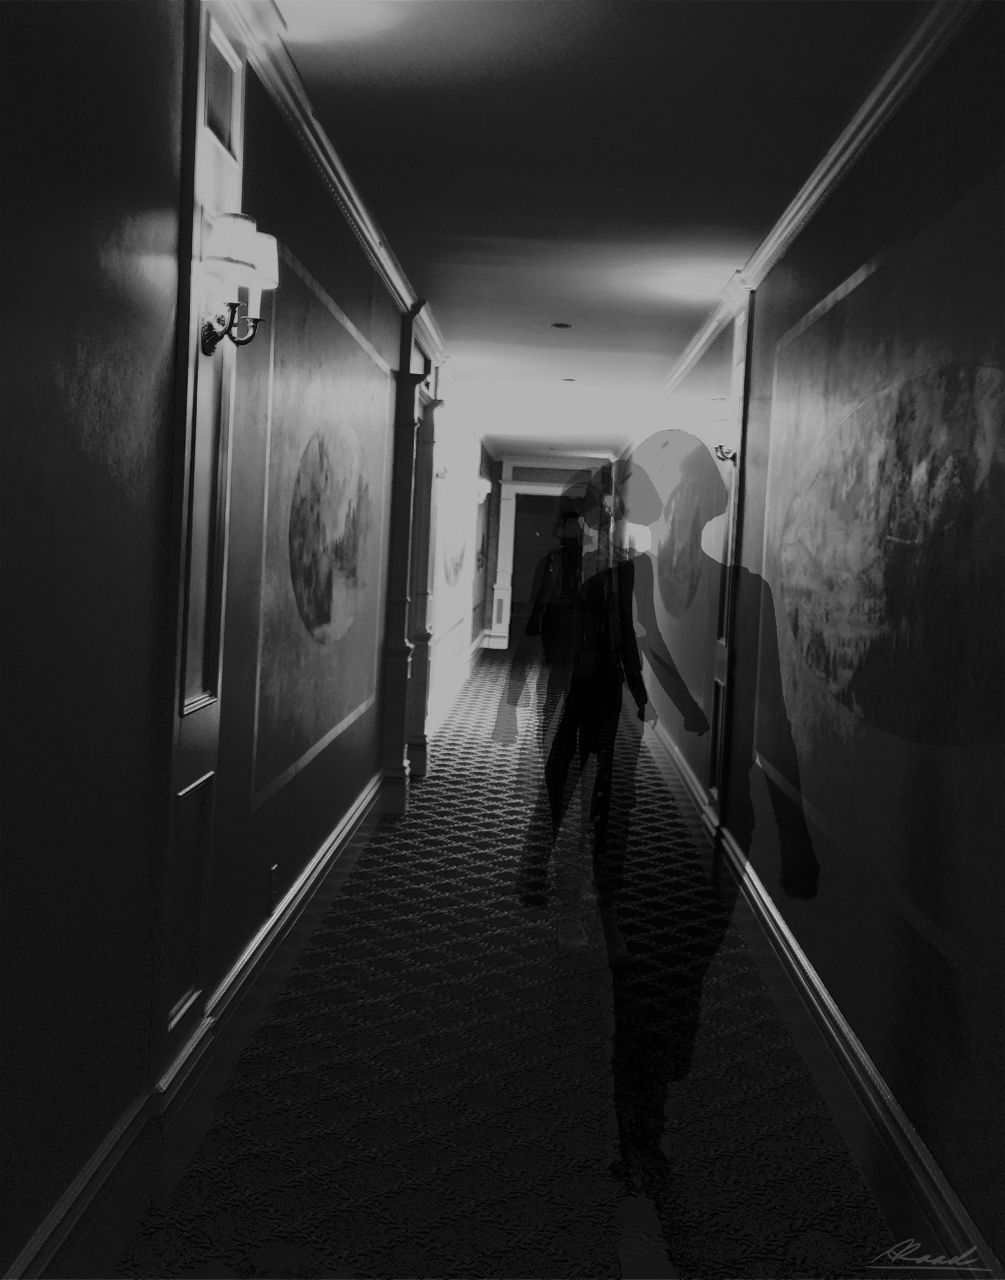 Aziz Raad, Figure in the Hallway, 2017. Photograph